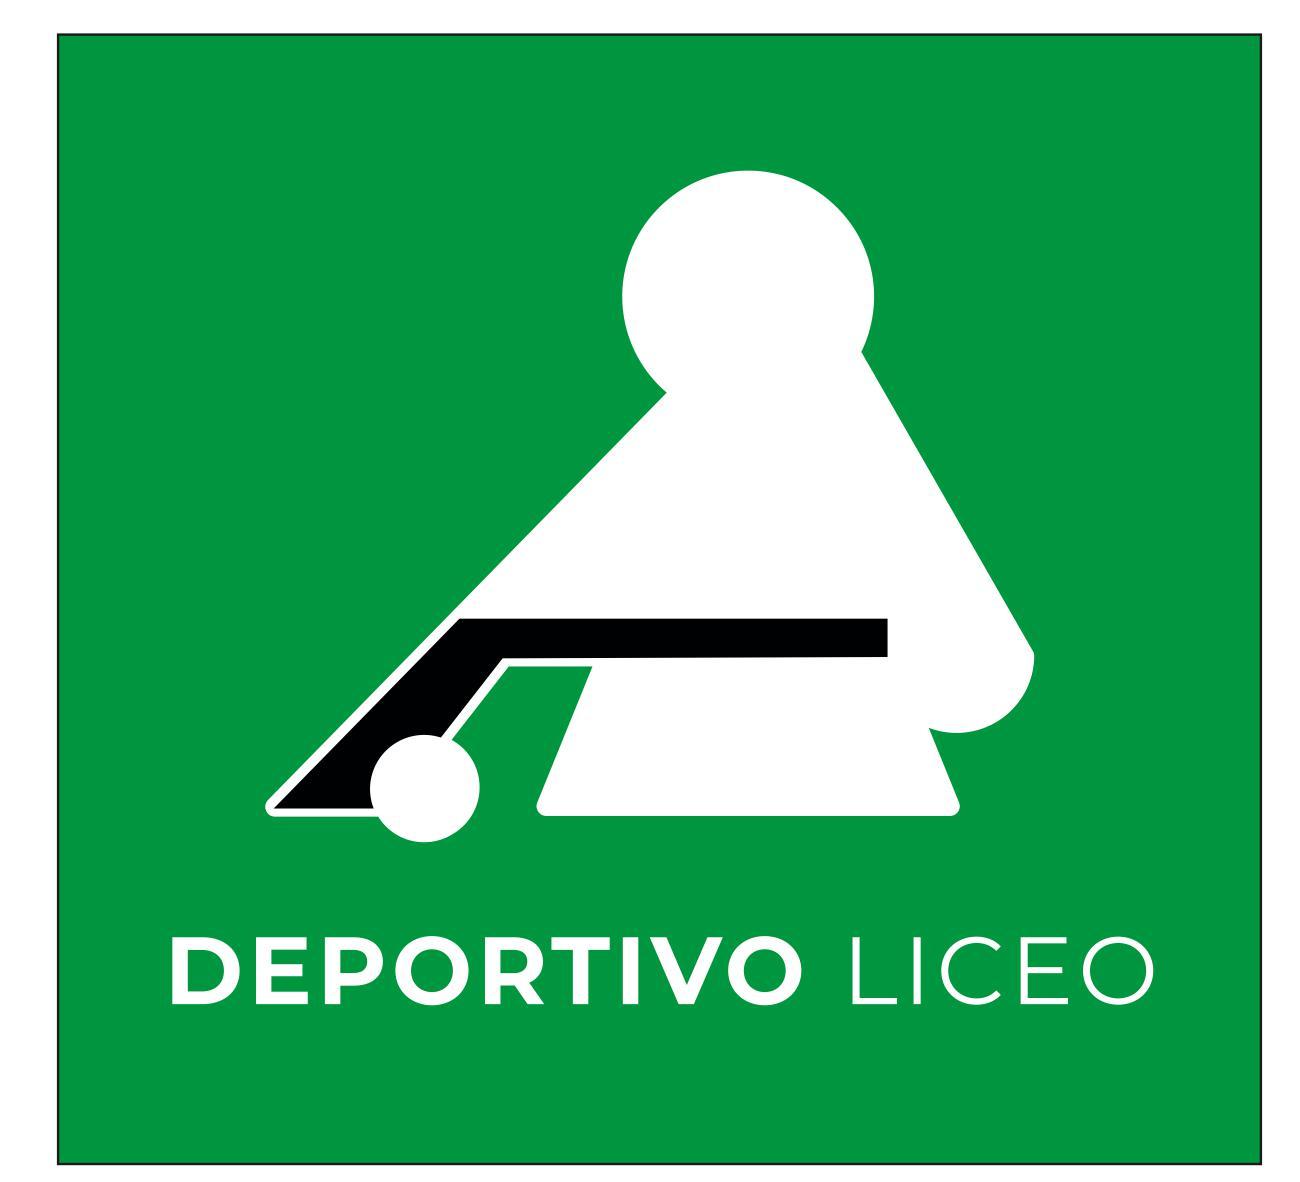 deportivo_liceo